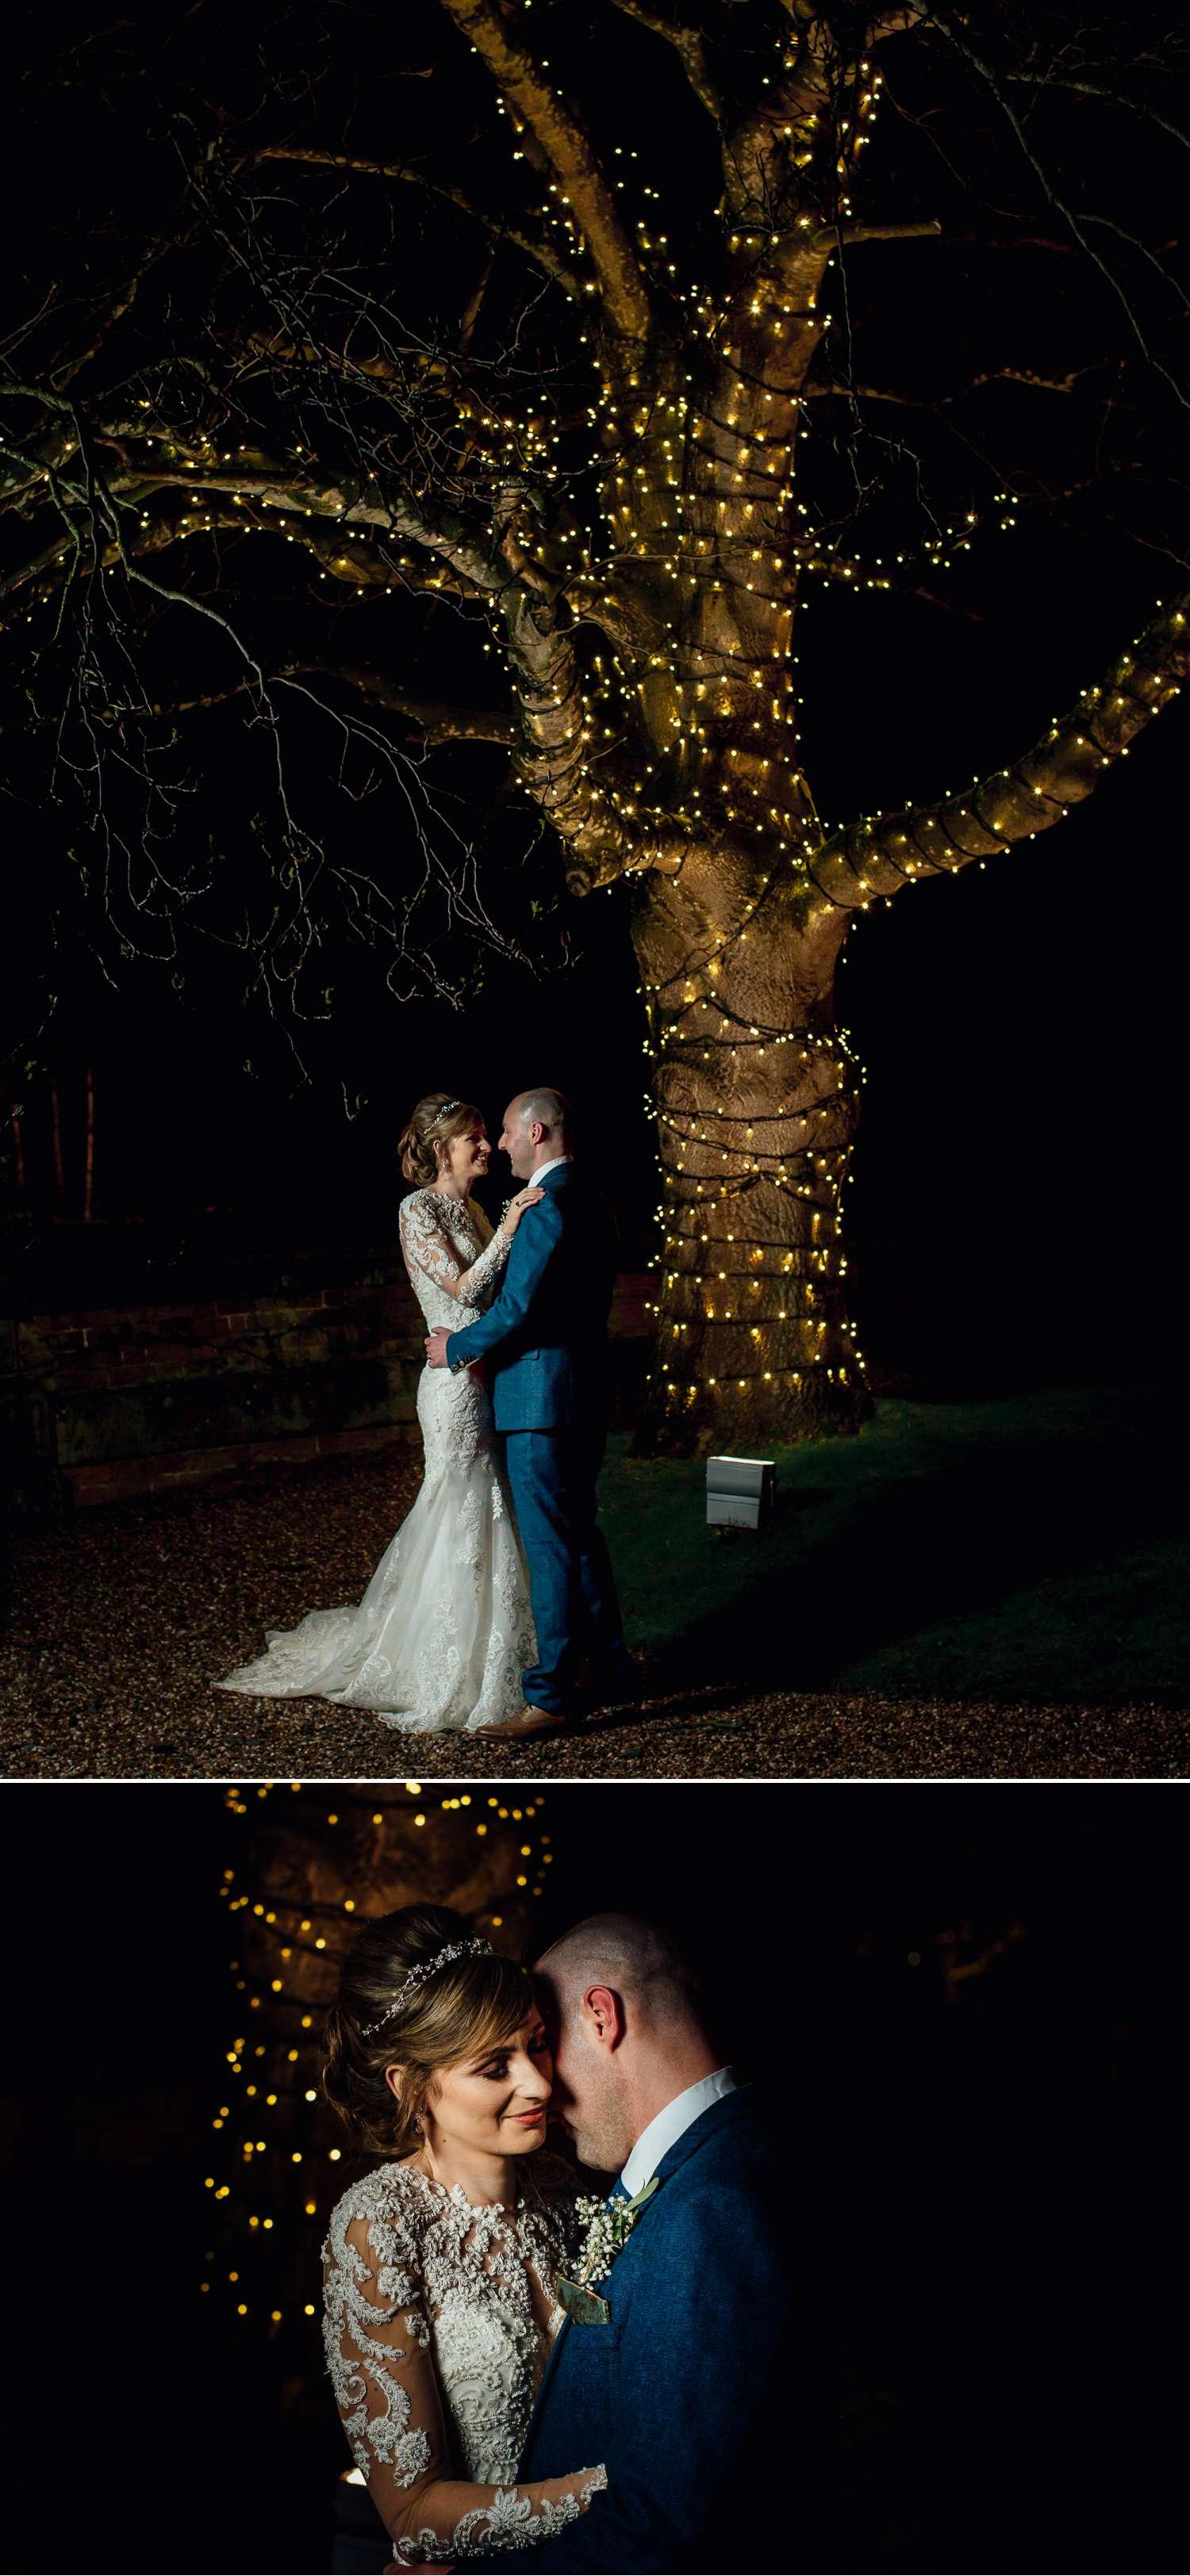 Iscoyd Park lit up tree bride and groom portraits